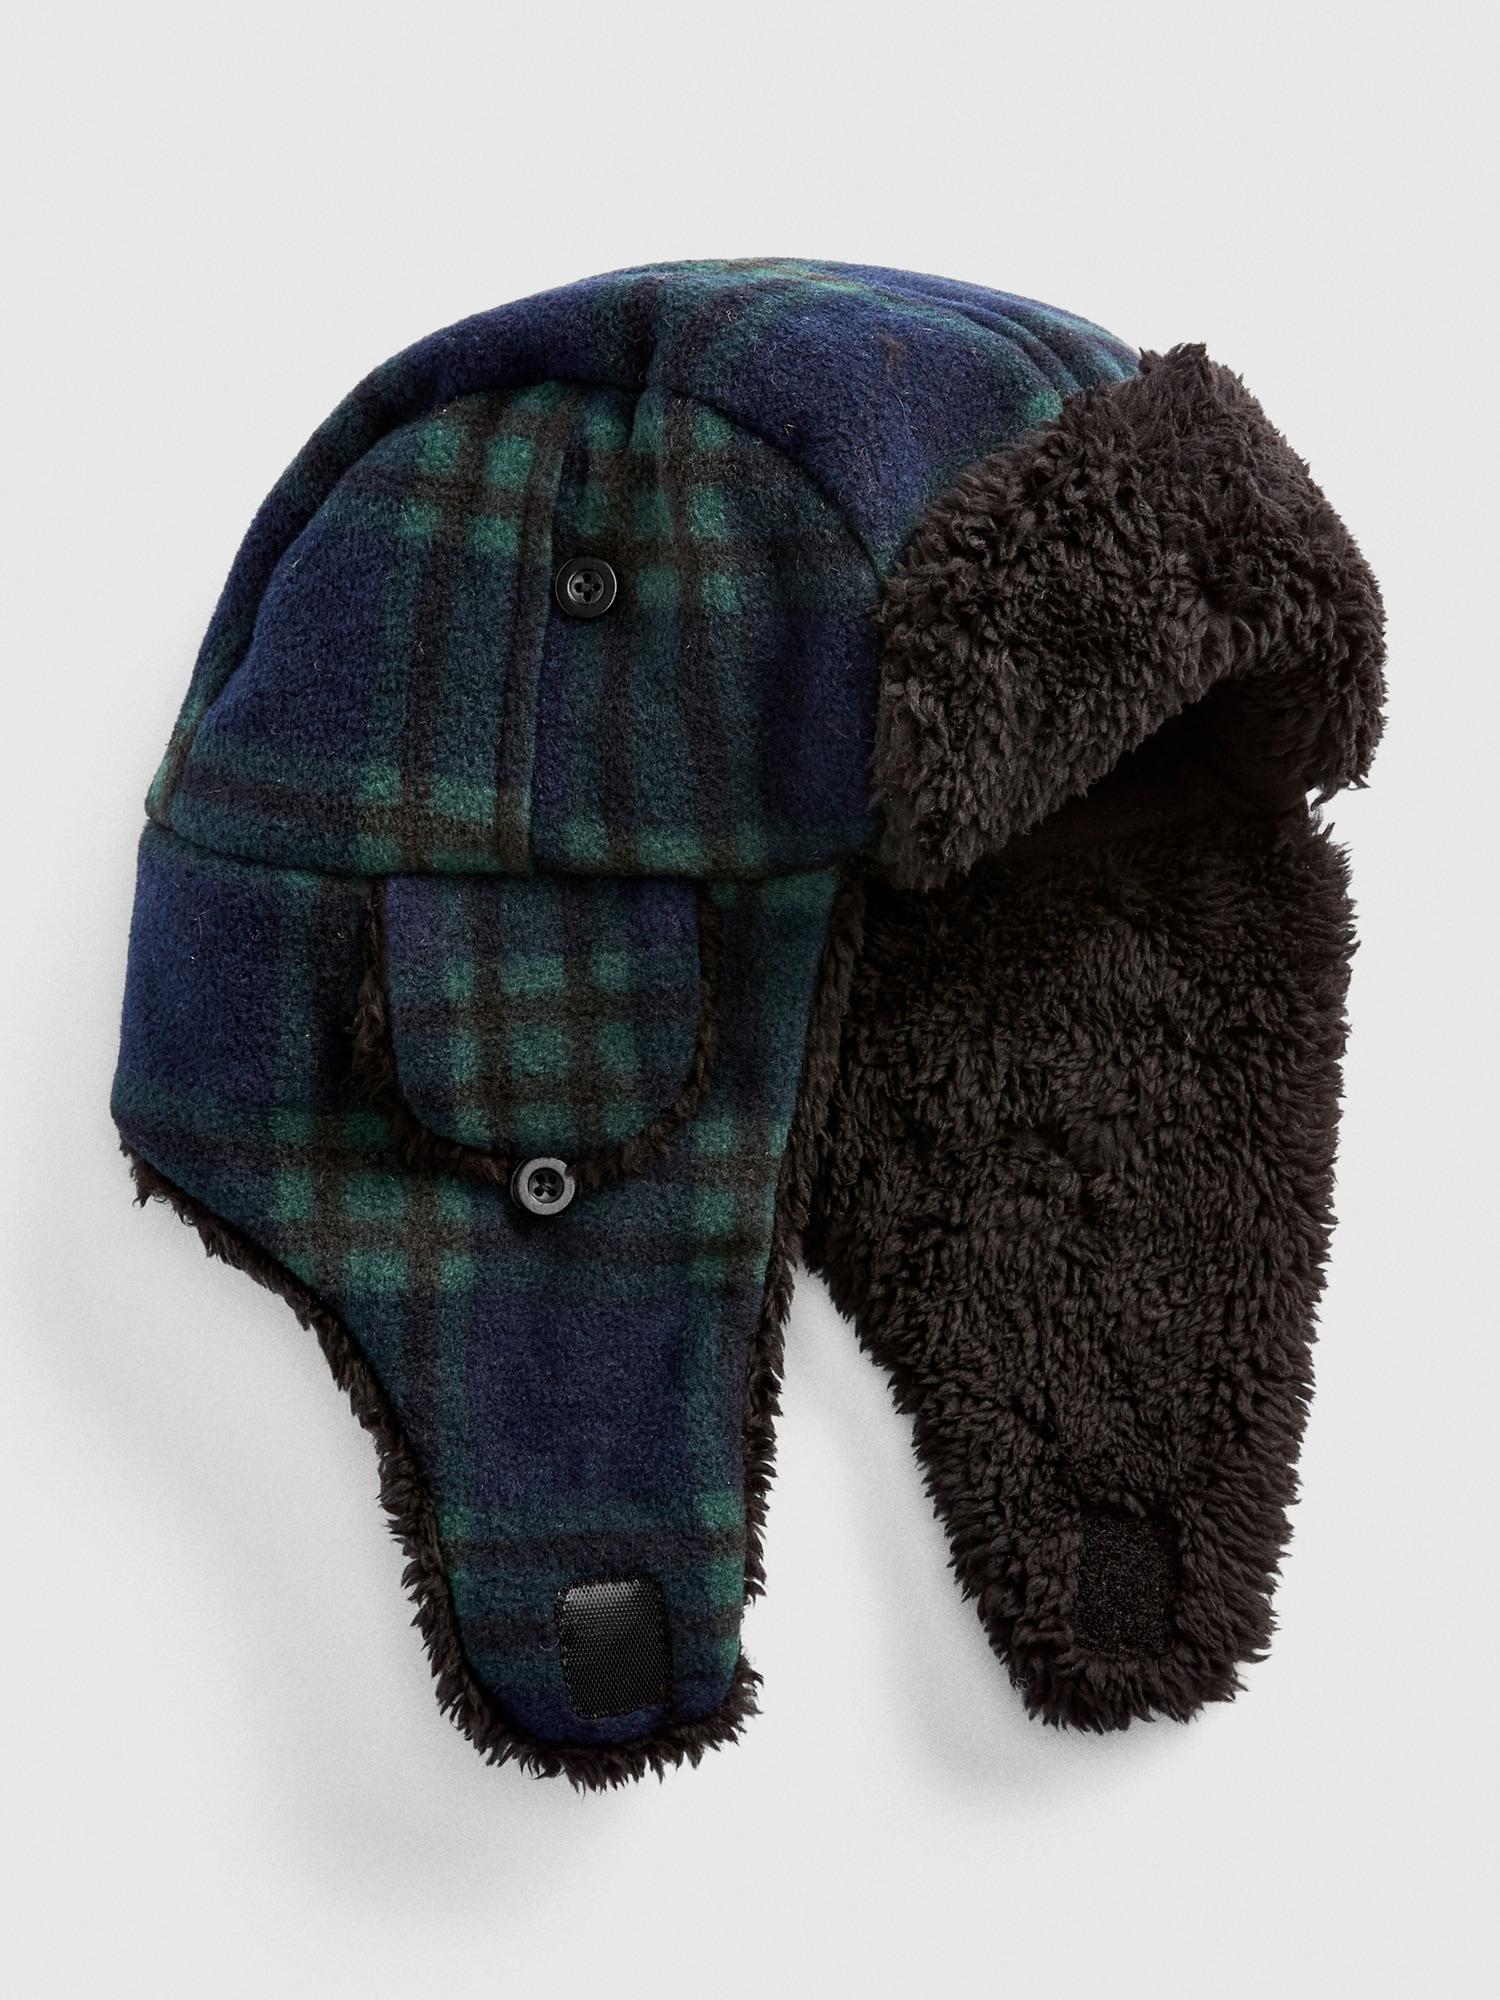 Cozy Flannel Trapper Hat aba5057f5b58